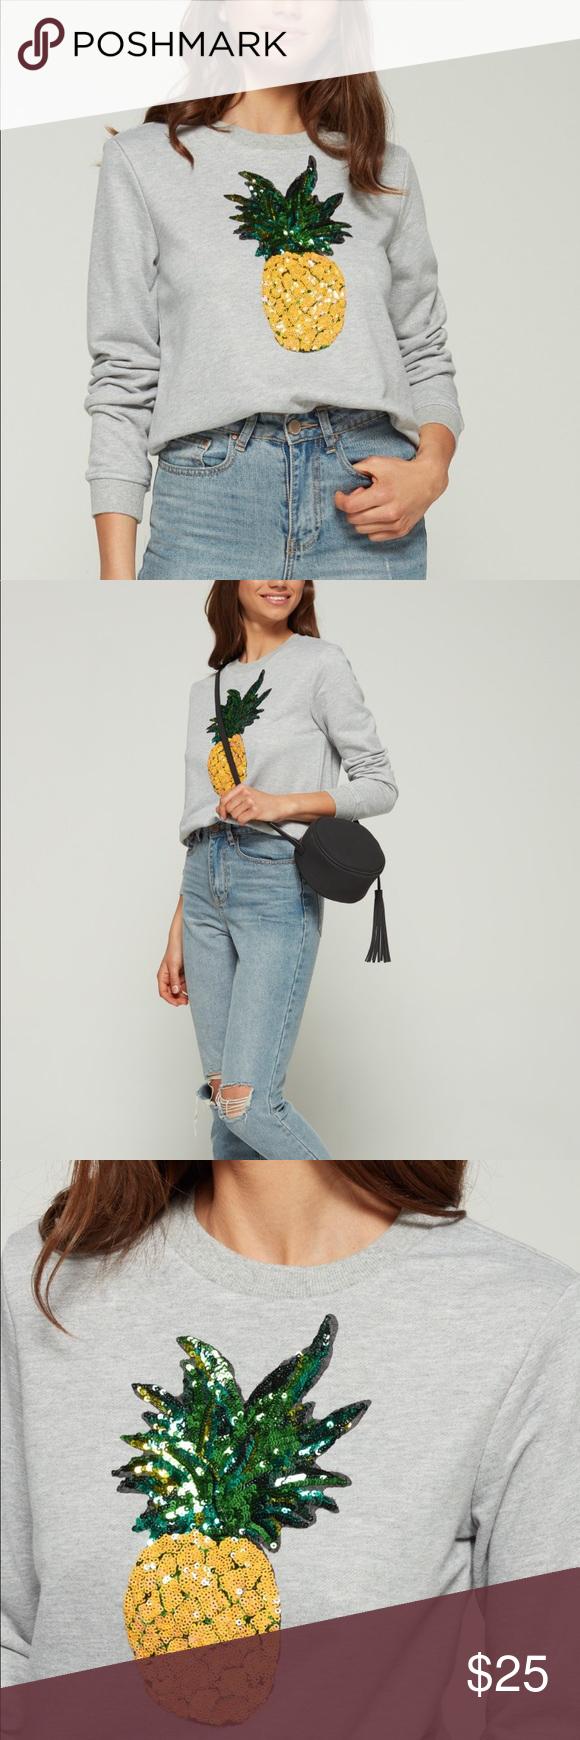 English Factory Sequin Pineapple Sweatshirt Clothes Design Fashion Fashion Design [ 1740 x 580 Pixel ]